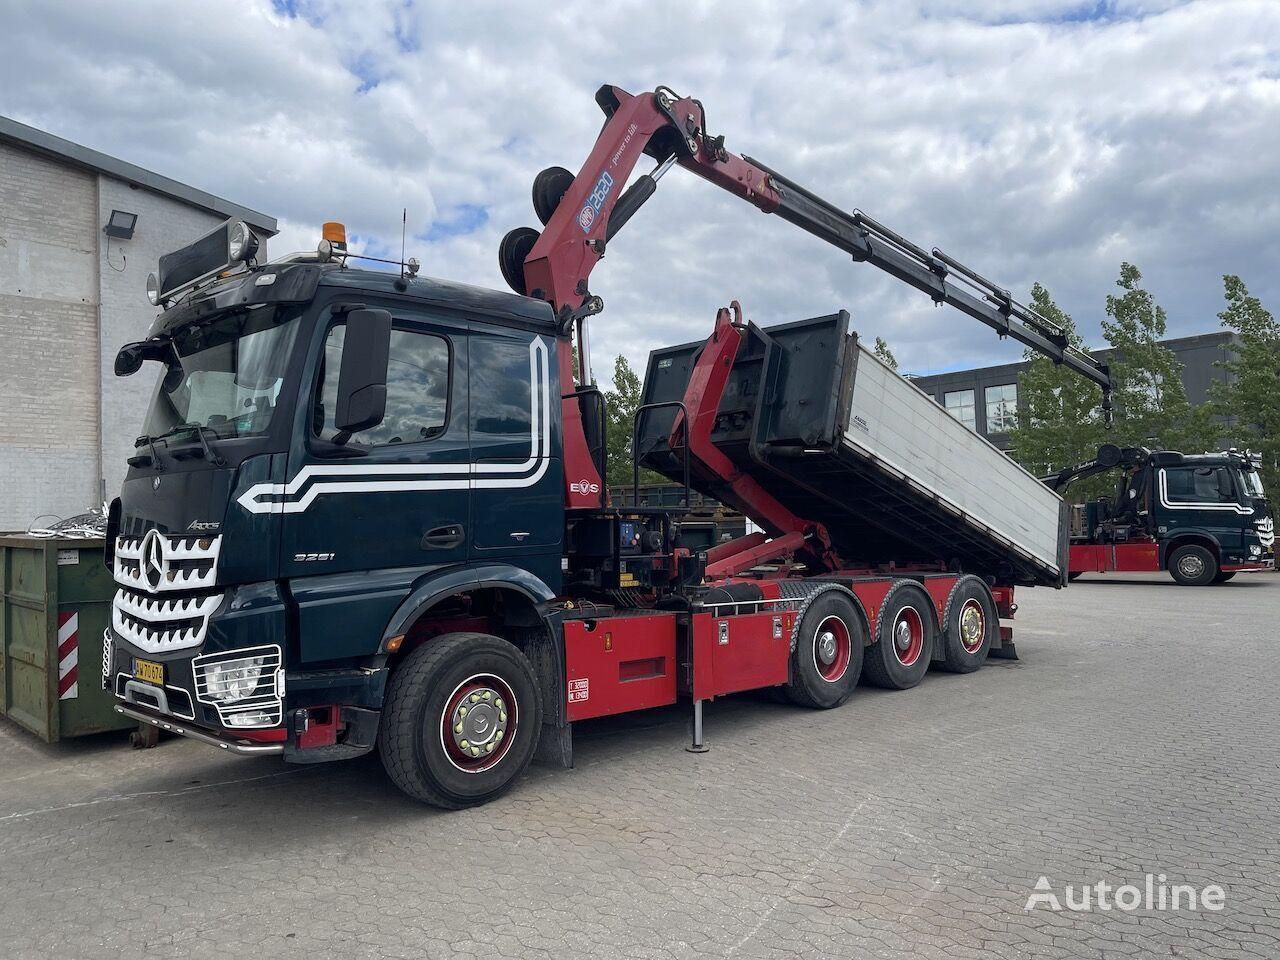 MERCEDES-BENZ Arocs 3251 hook lift truck